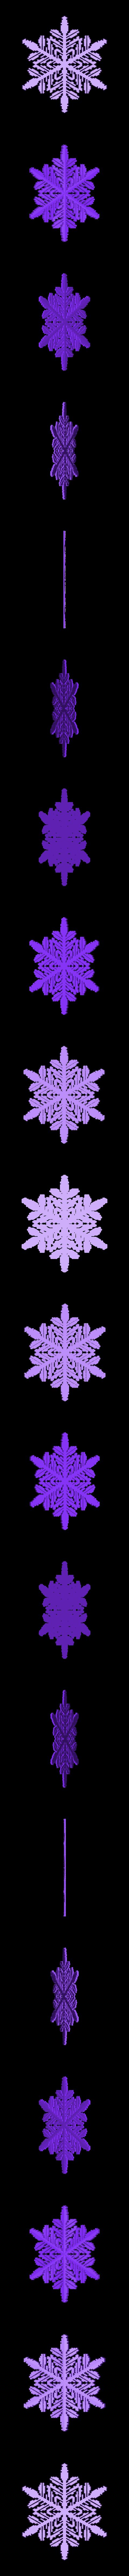 r40-rg4.stl Download free STL file Snowflake growth simulation in BlocksCAD • 3D printing design, arpruss